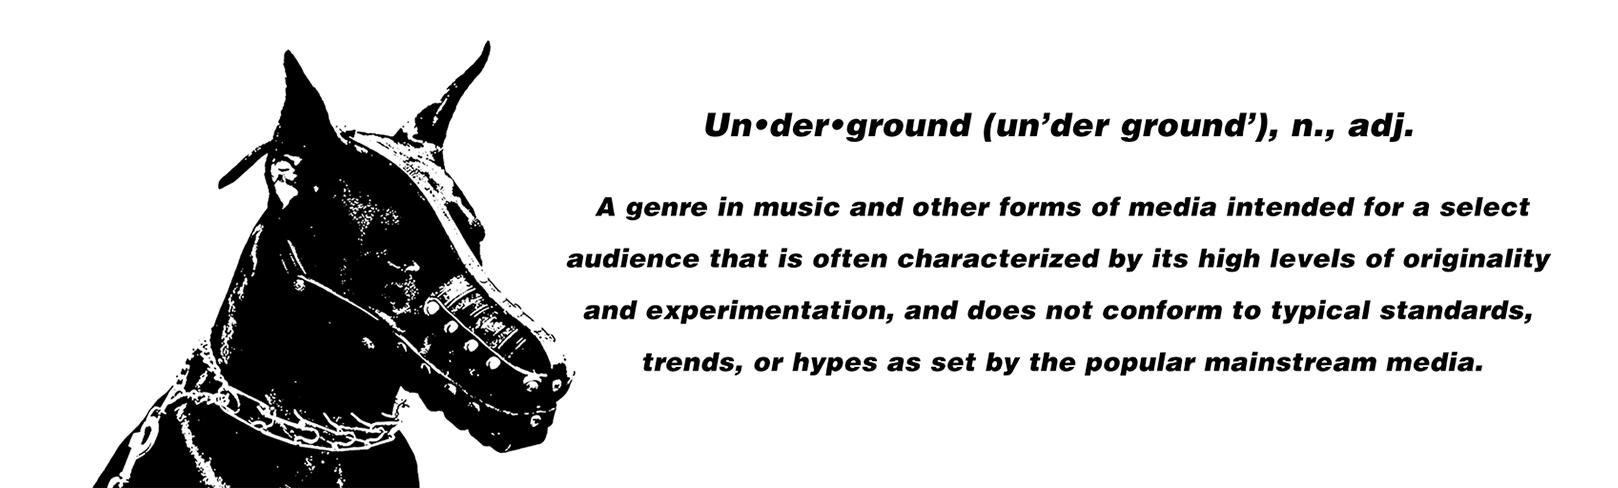 Izaq rolands step into the shadows whats next underground underdogs the underground media outlet biocorpaavc